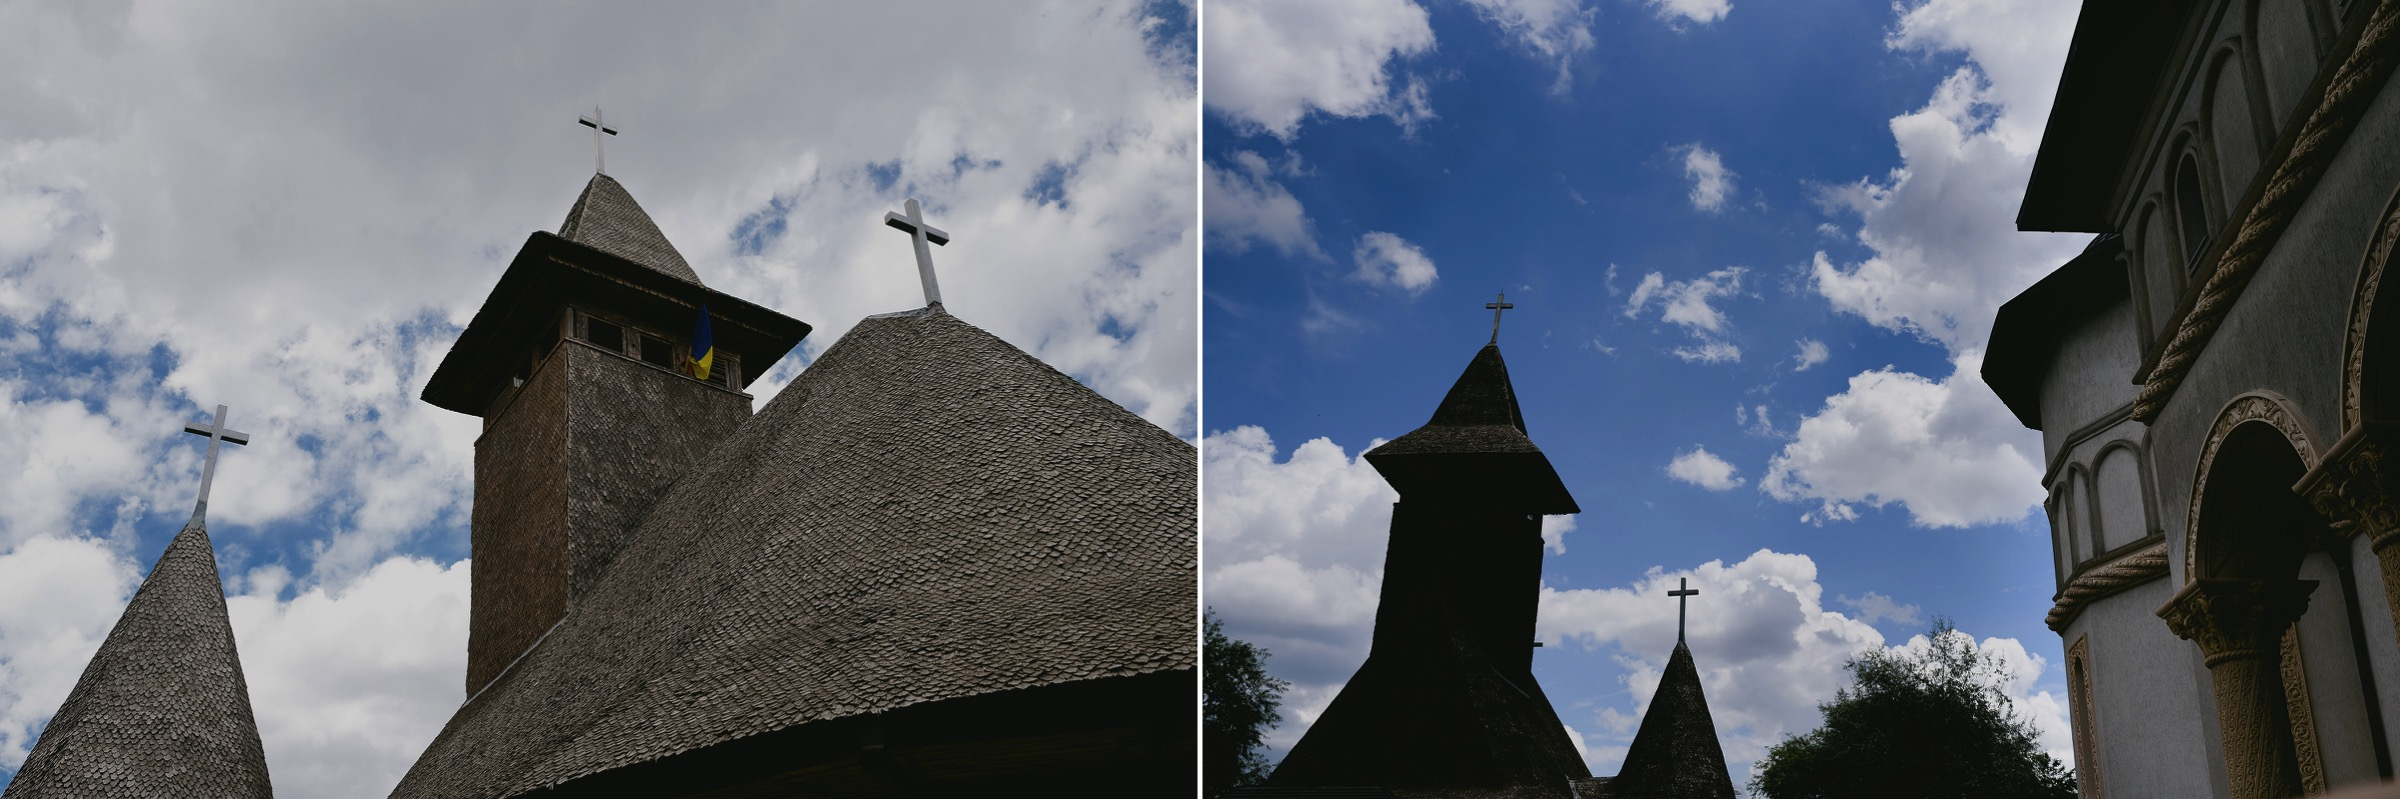 biserica in bucuresti